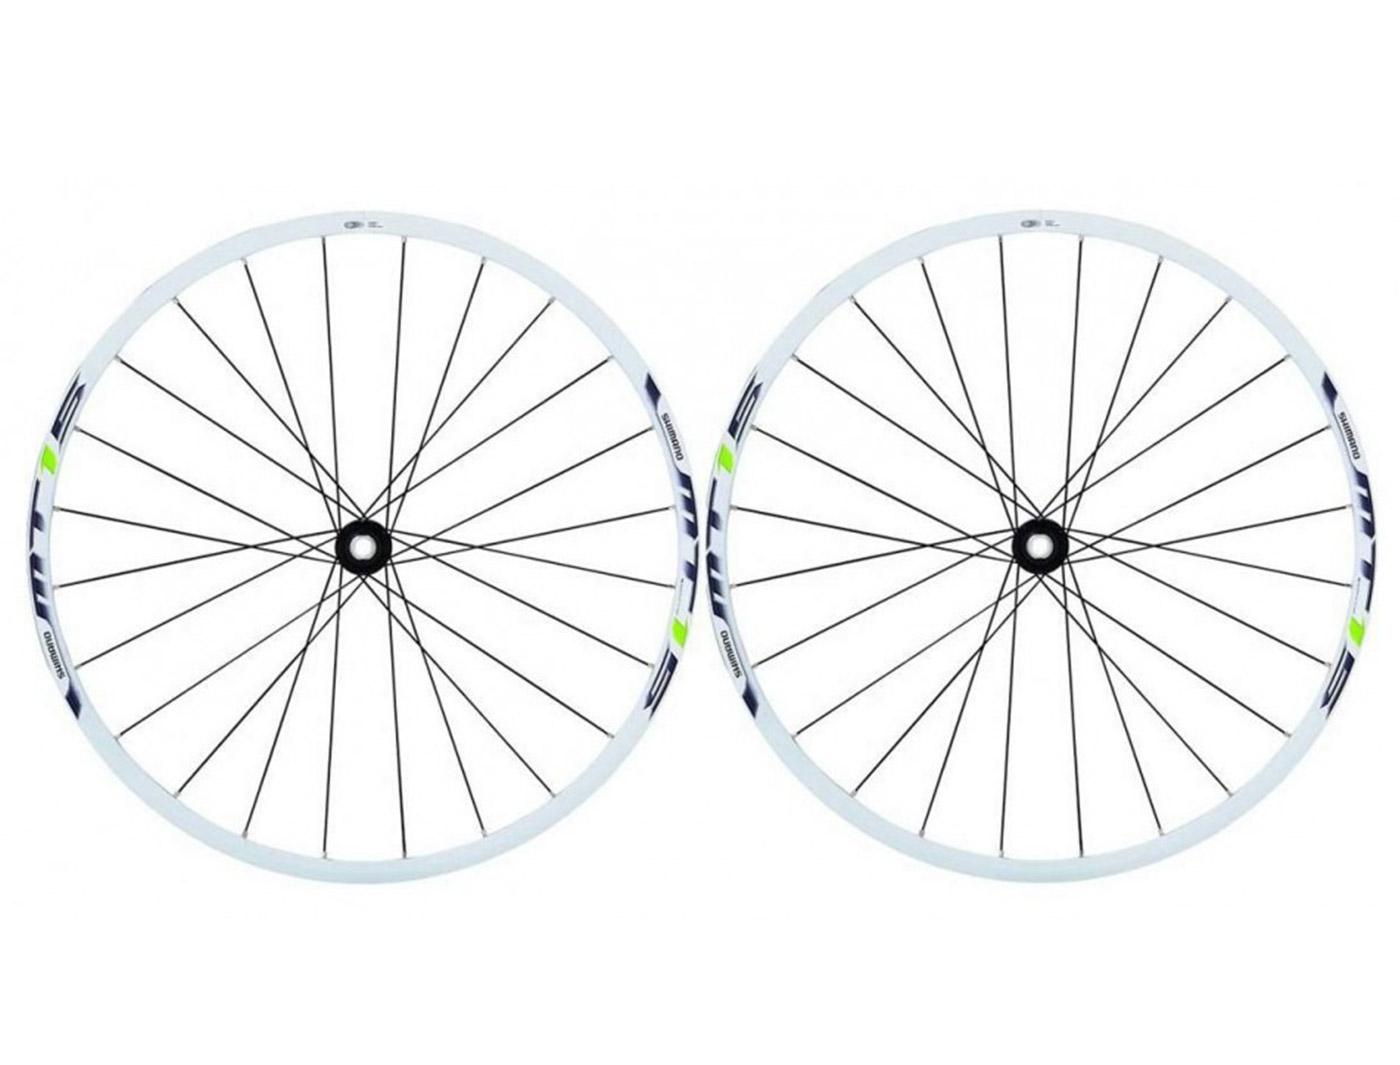 Комплект колес Shimano, MT15A, передн. и задн, 27,5', C.Lock, QR, цв. бел/зел